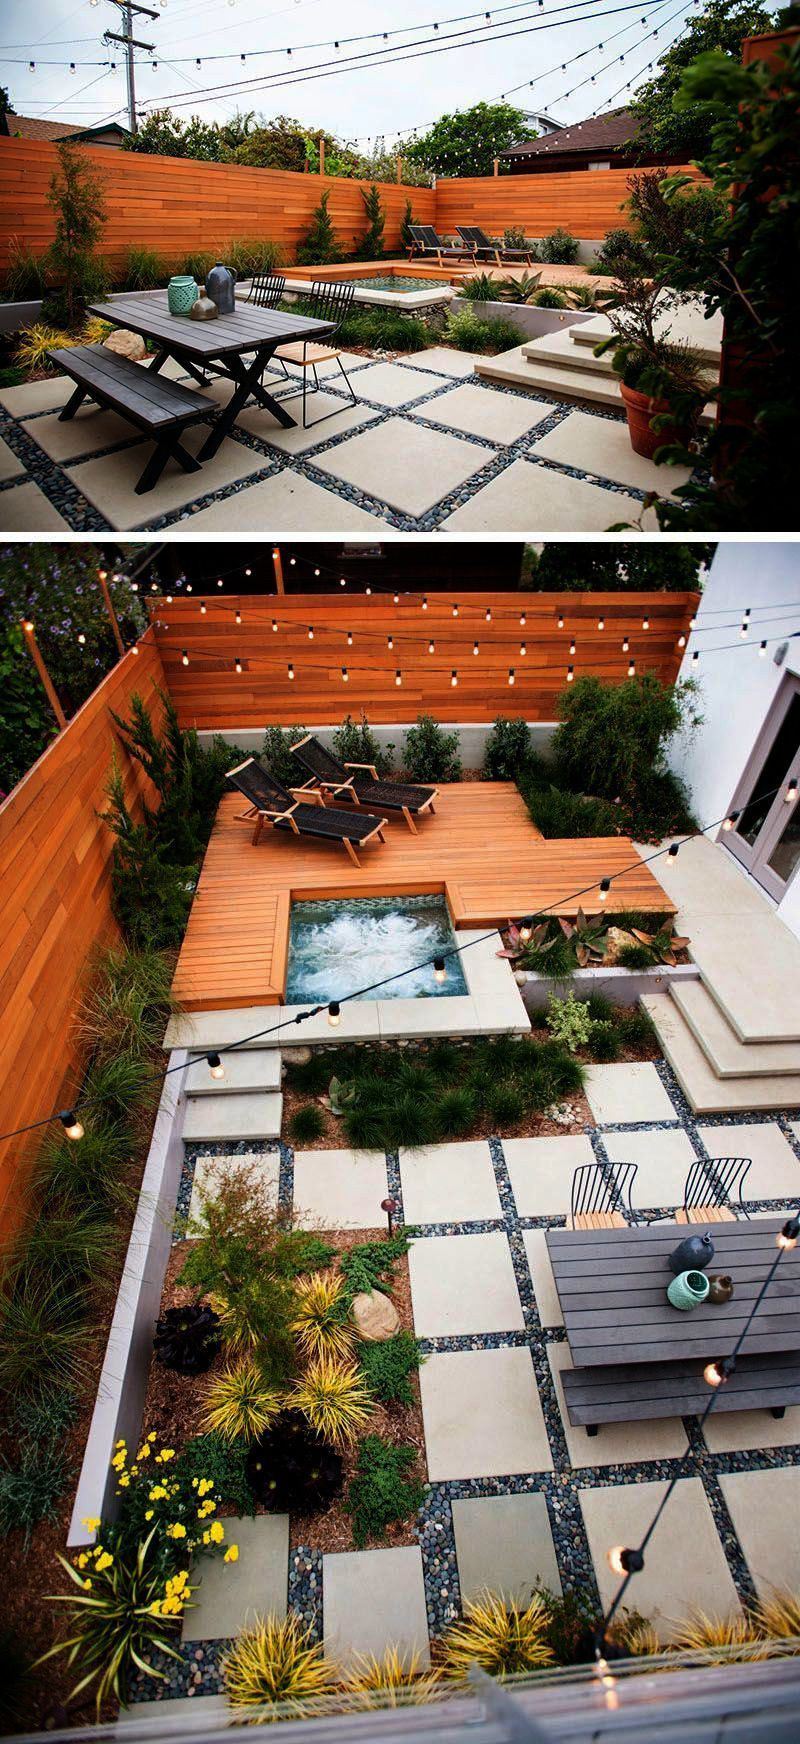 18 Backyard Patio Design App Diy Patio Design Software Orice Modern Backyard Backyard Backyard Ideas For Small Yards